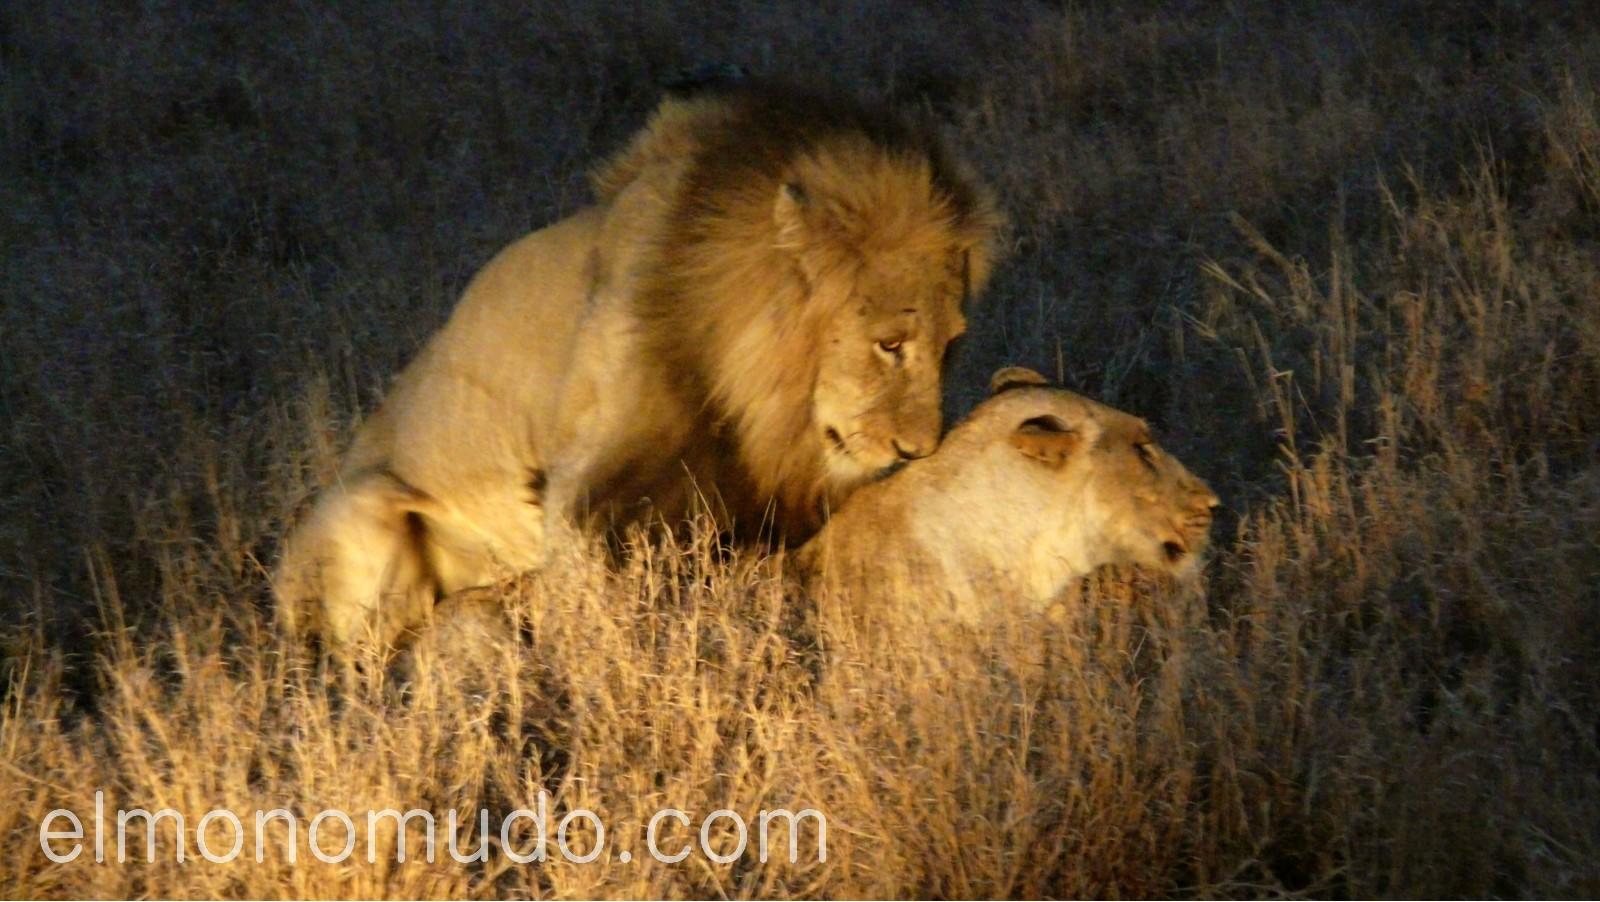 leones apareándose en la noche del Kruger National Park